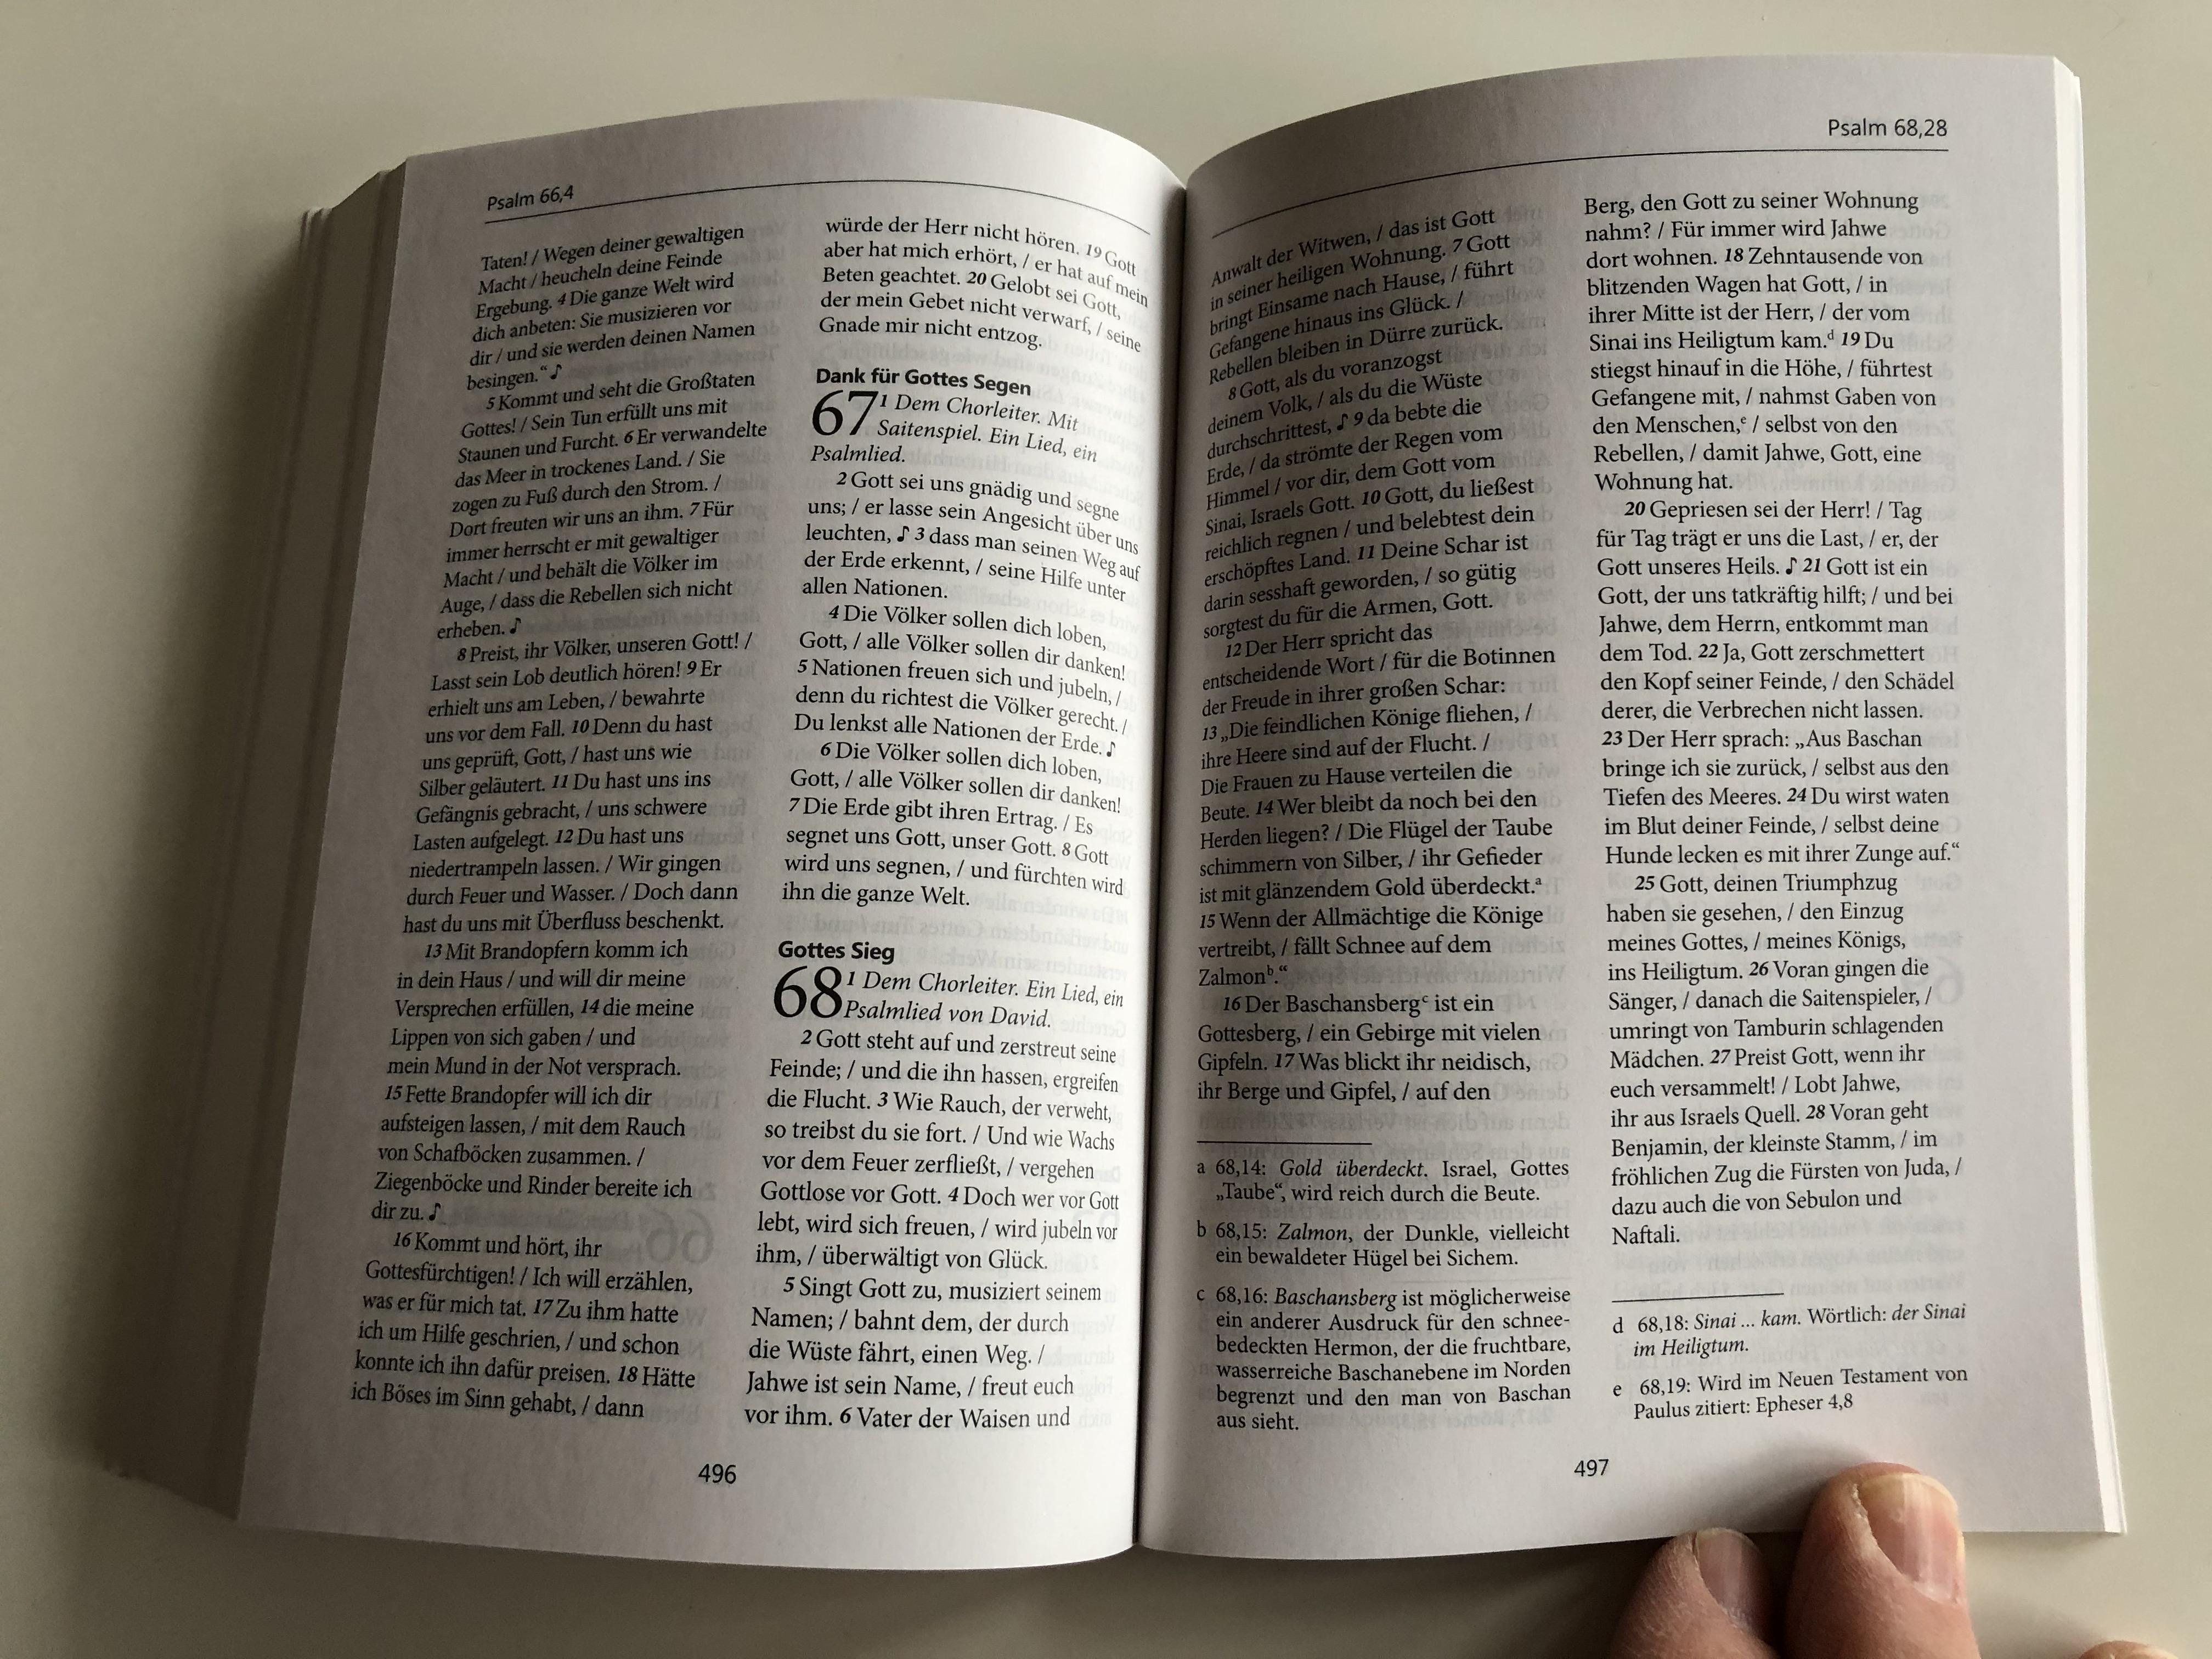 bibel.heute-german-language-nt-with-psalms-8.jpg